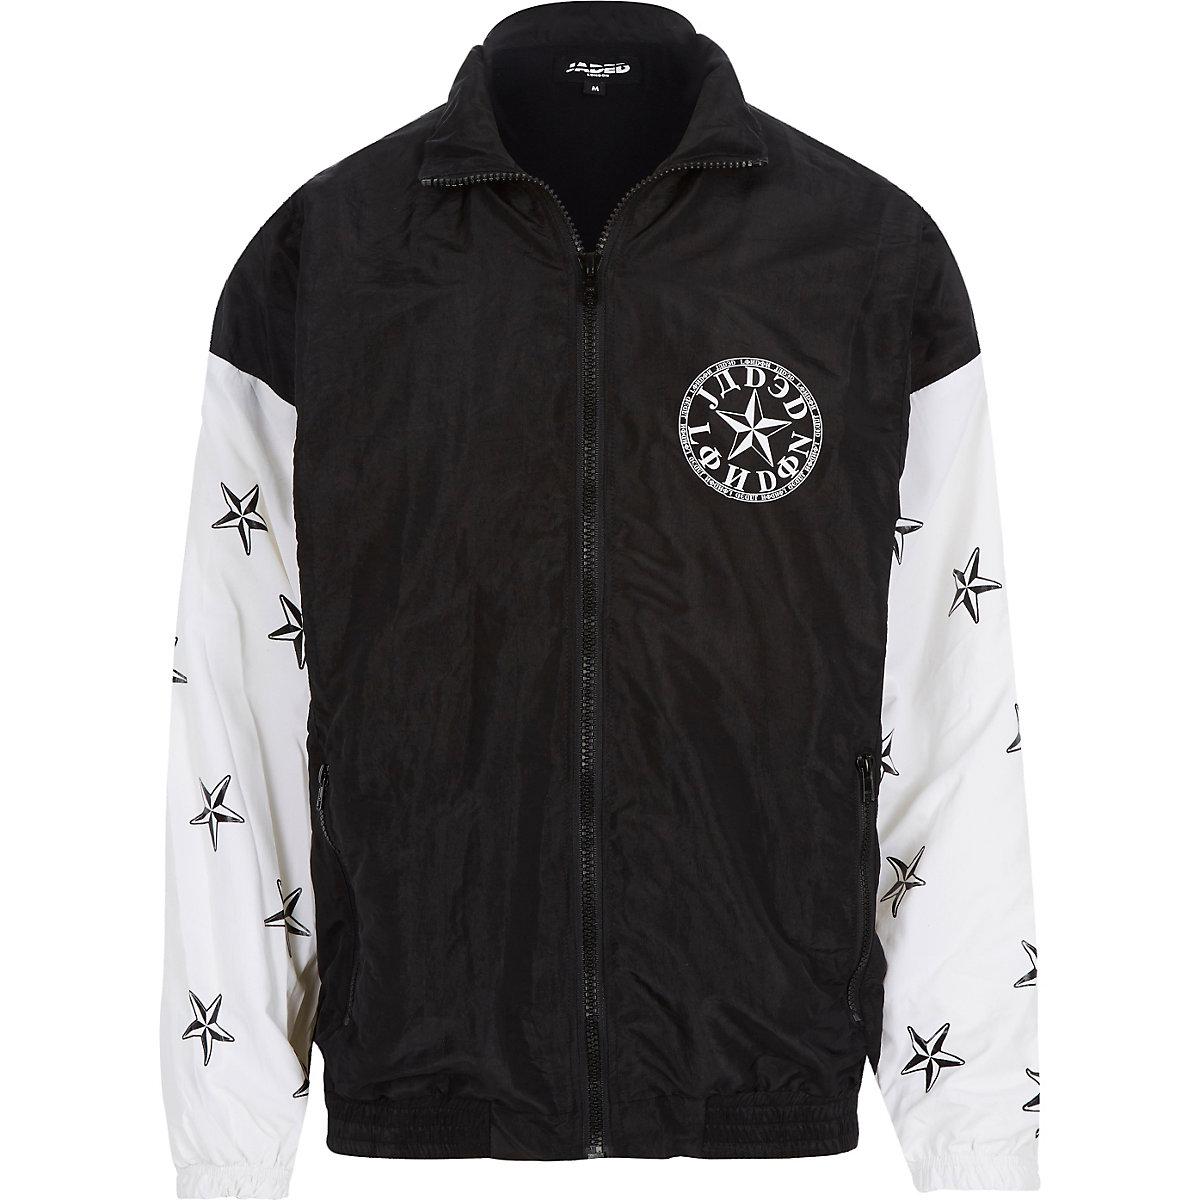 Black Jaded star print shellsuit jacket